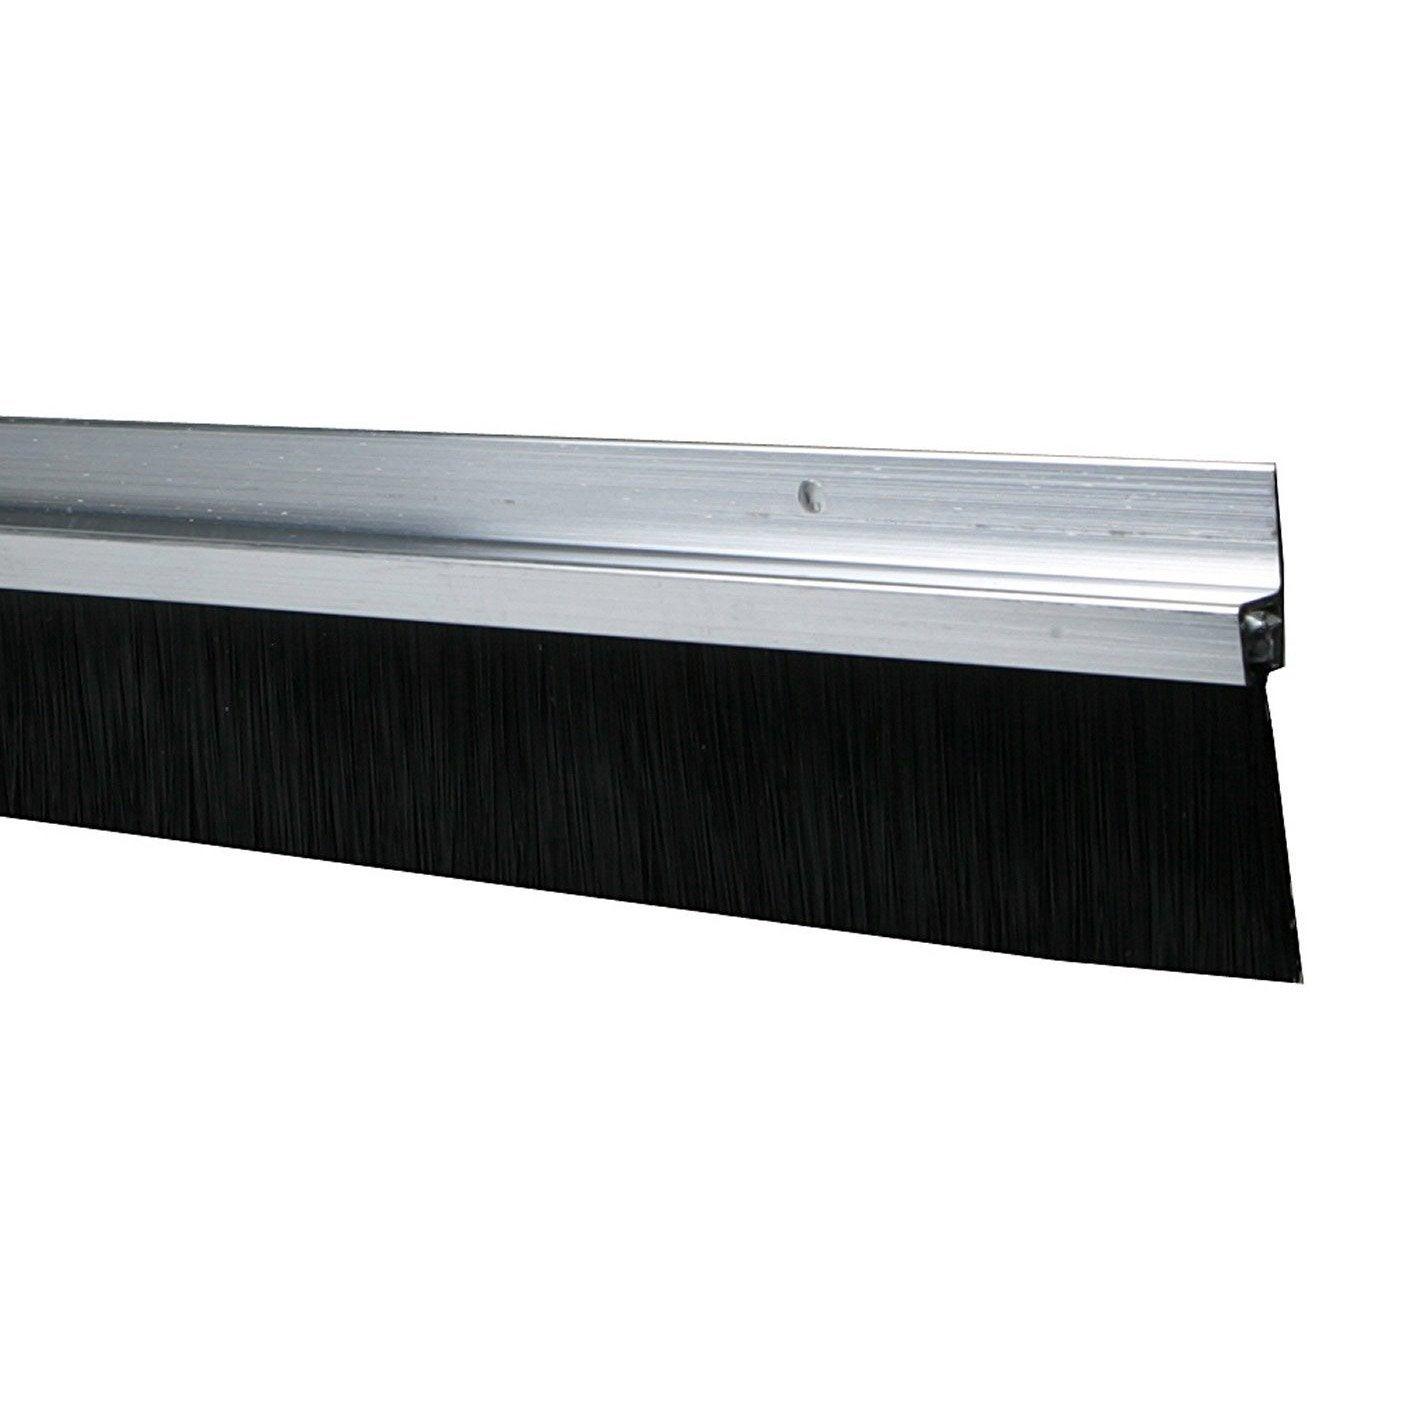 bas de porte visser brosse axton long 250 cm aluminium leroy merlin. Black Bedroom Furniture Sets. Home Design Ideas